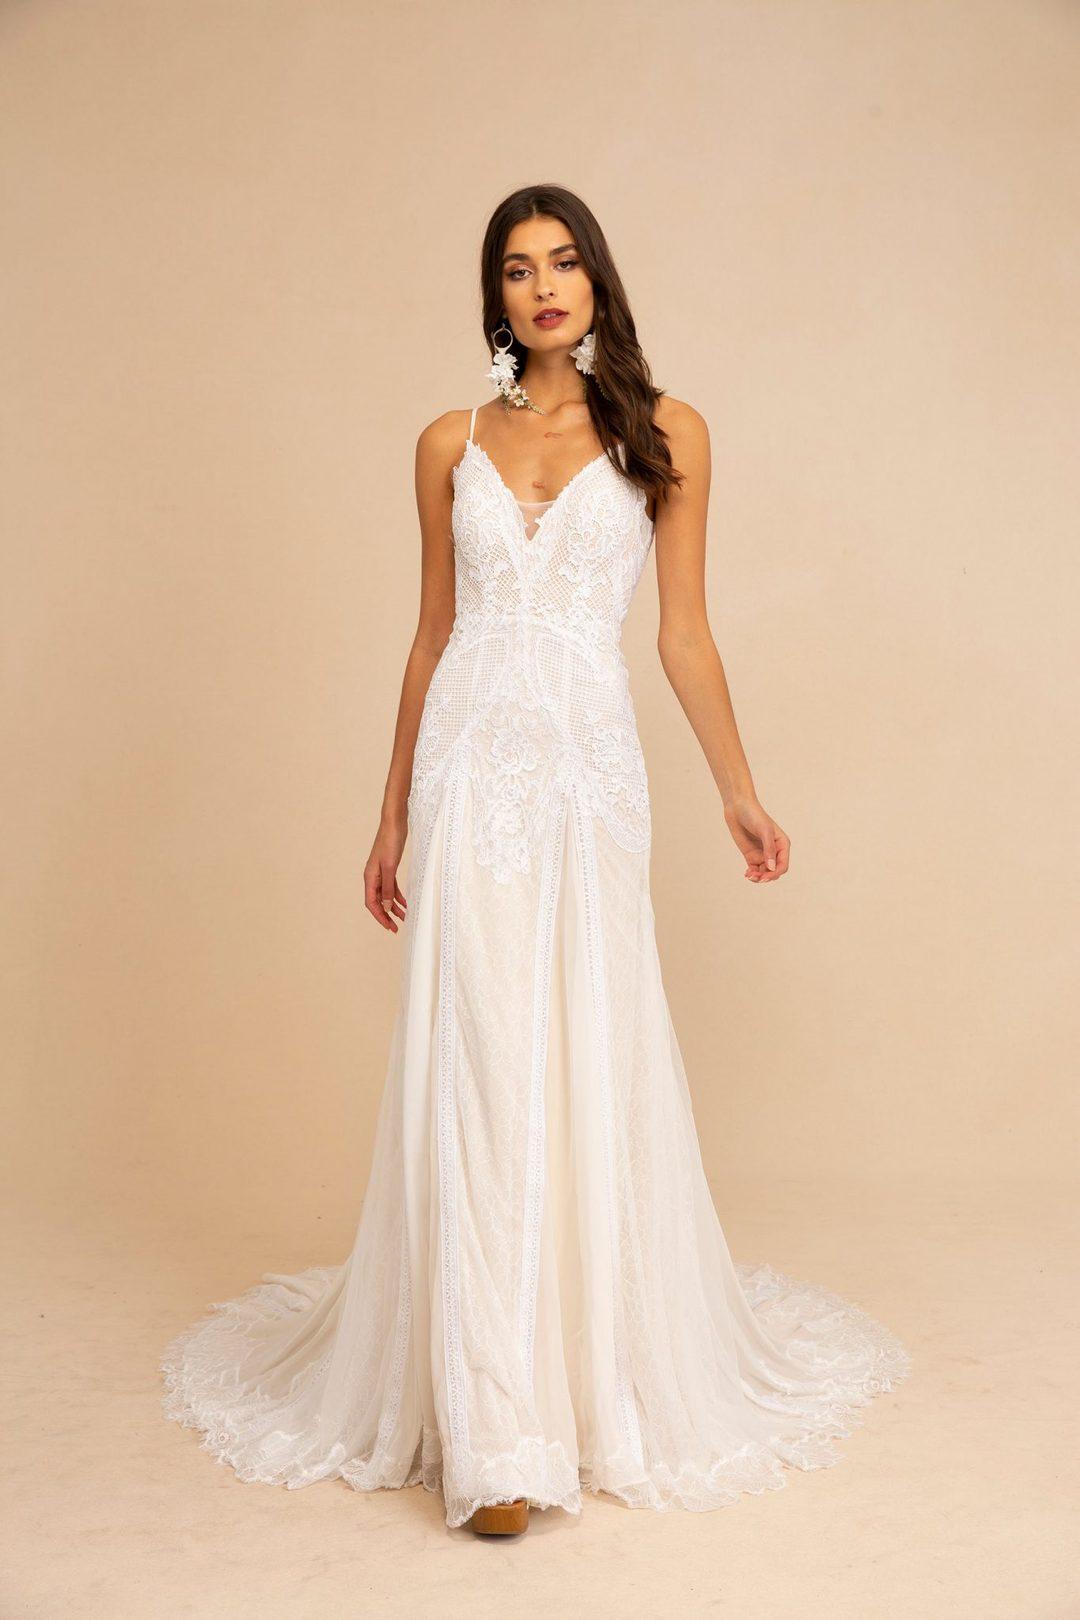 Dress main 2x 1548937960